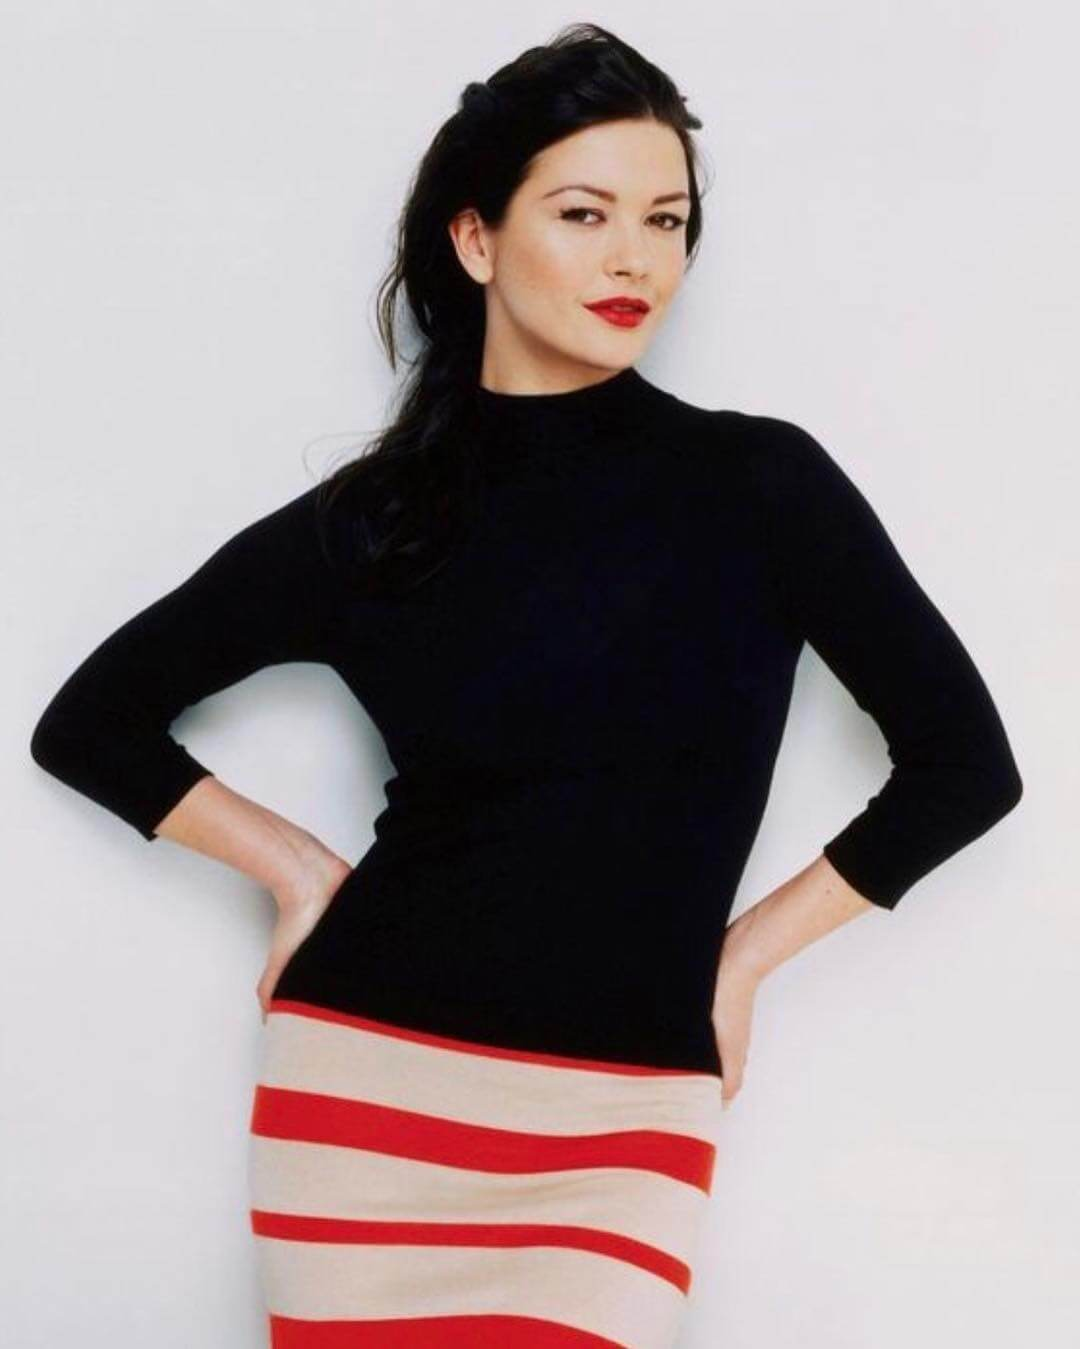 50 Hottest Catherine Zeta-Jones Photos - 12Thblog-9970